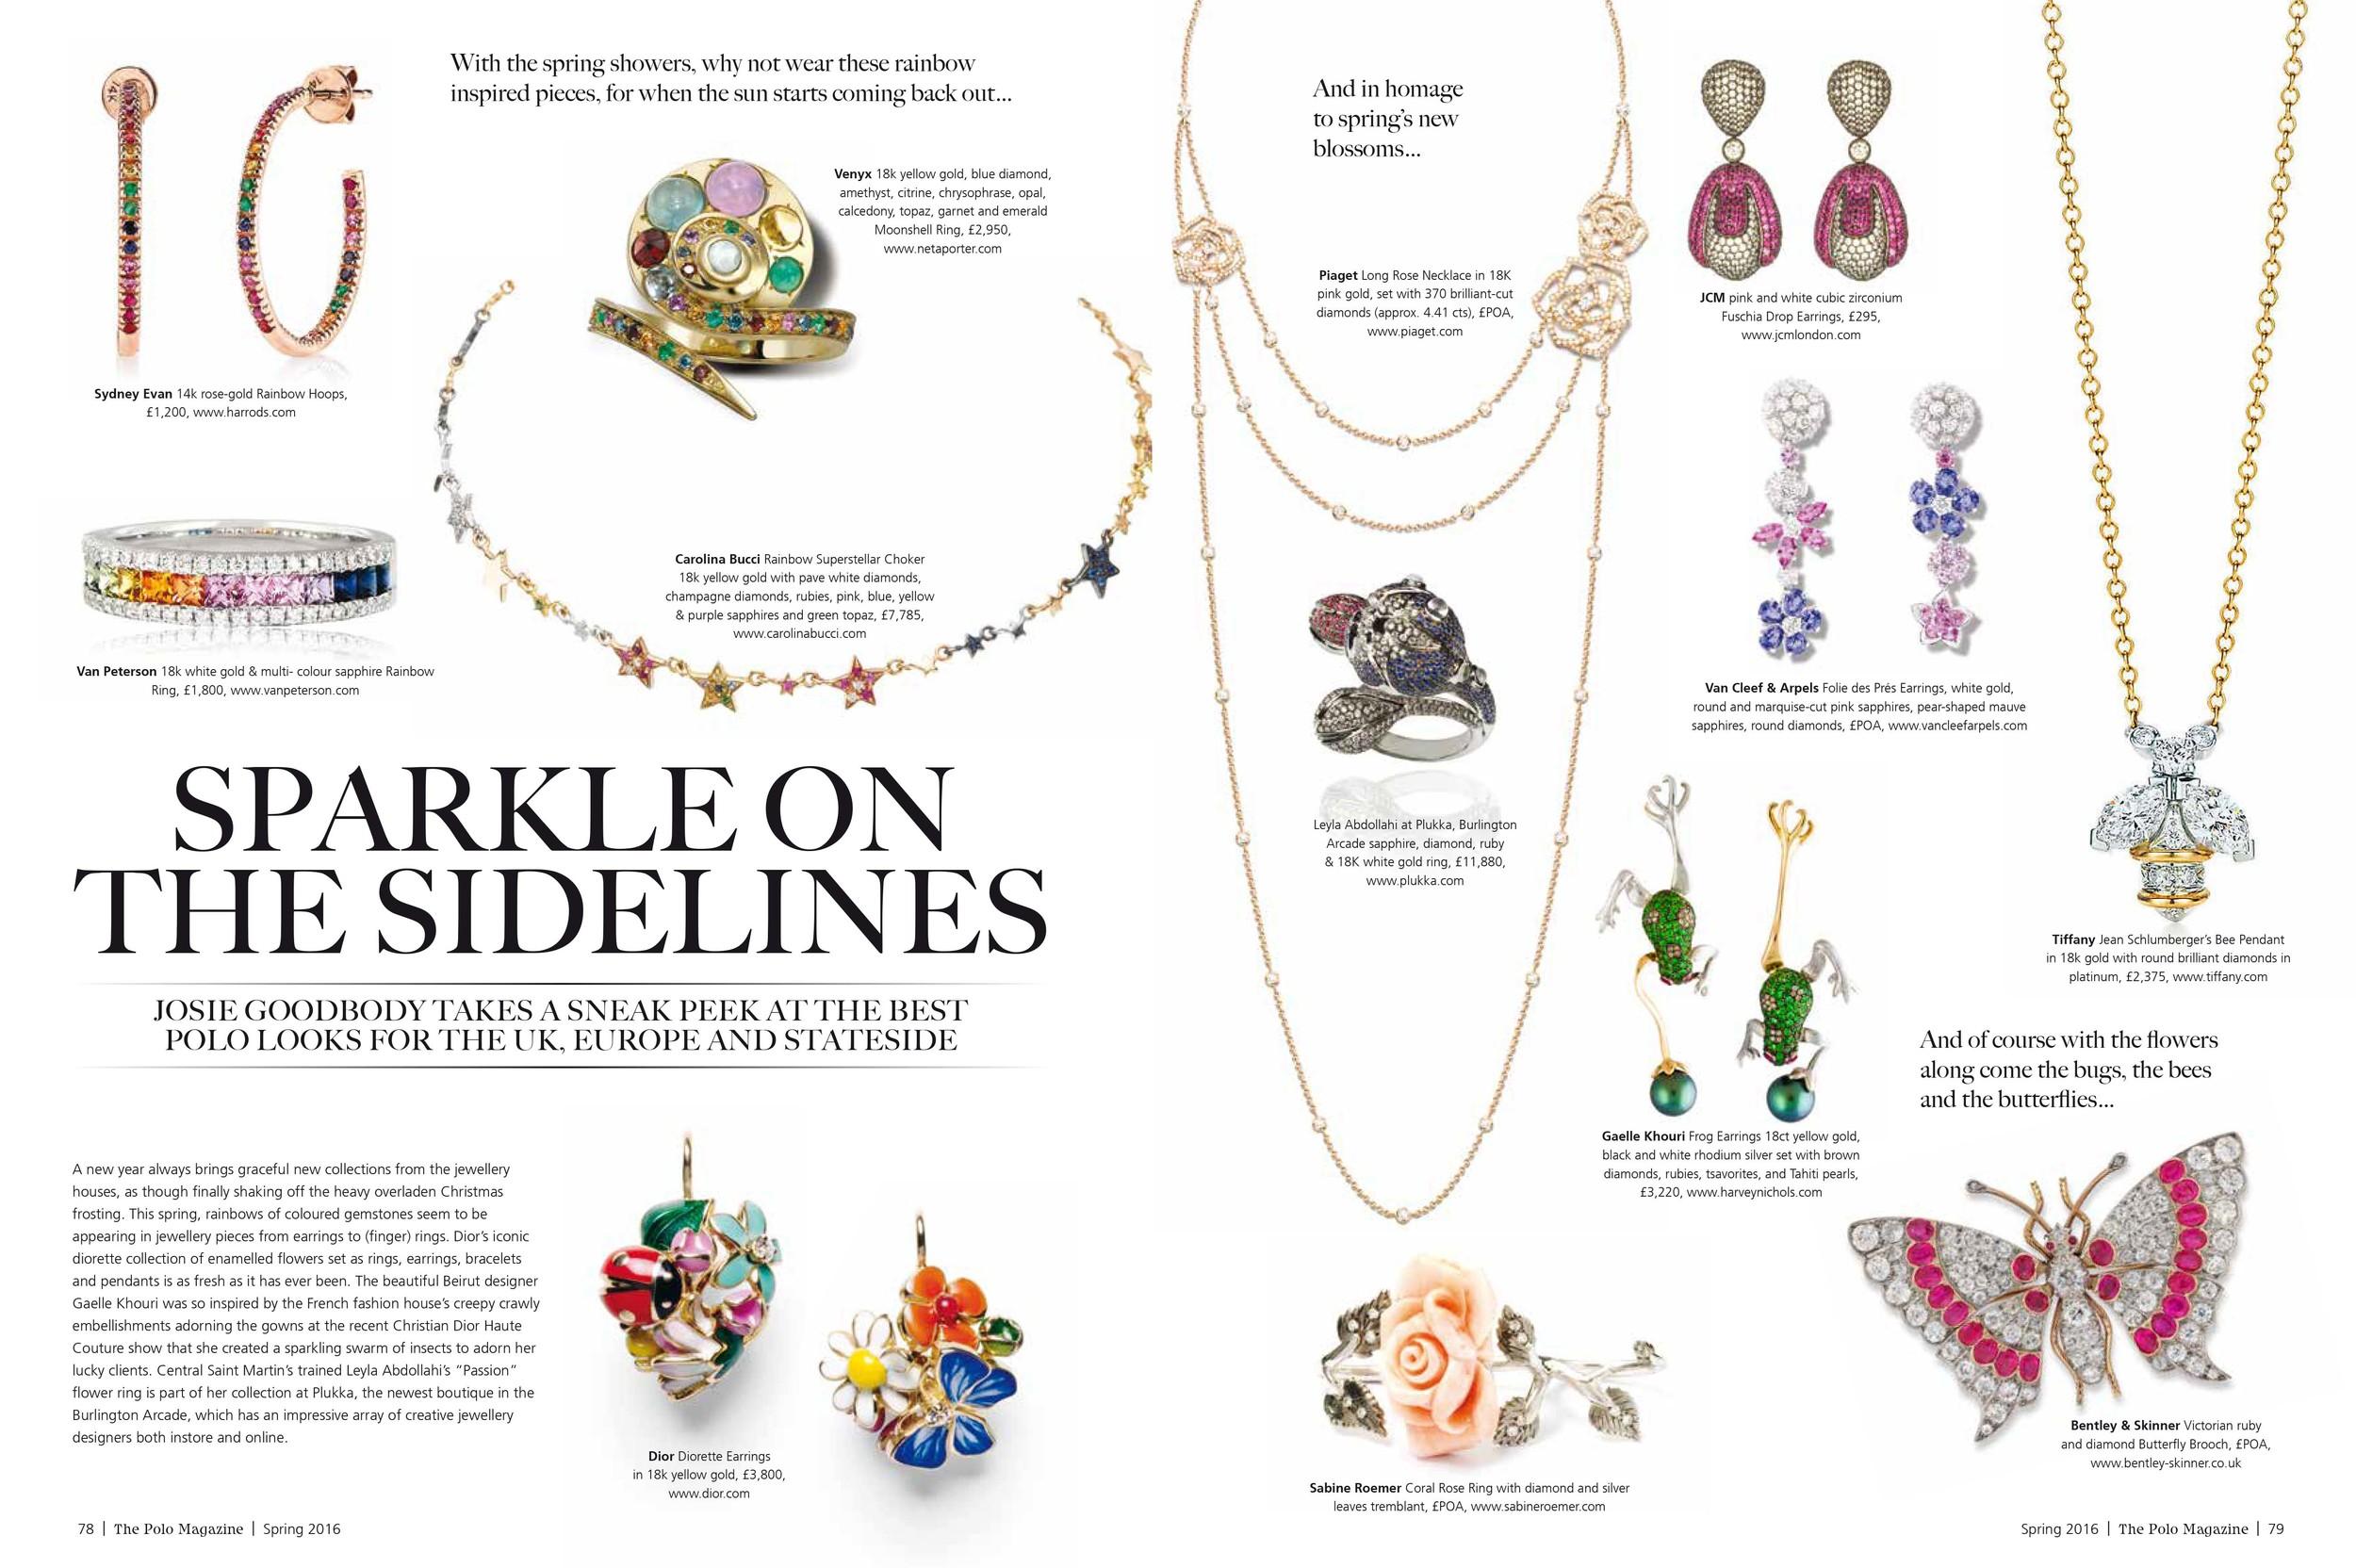 Josie-Goodbody-Jewellery - Articles